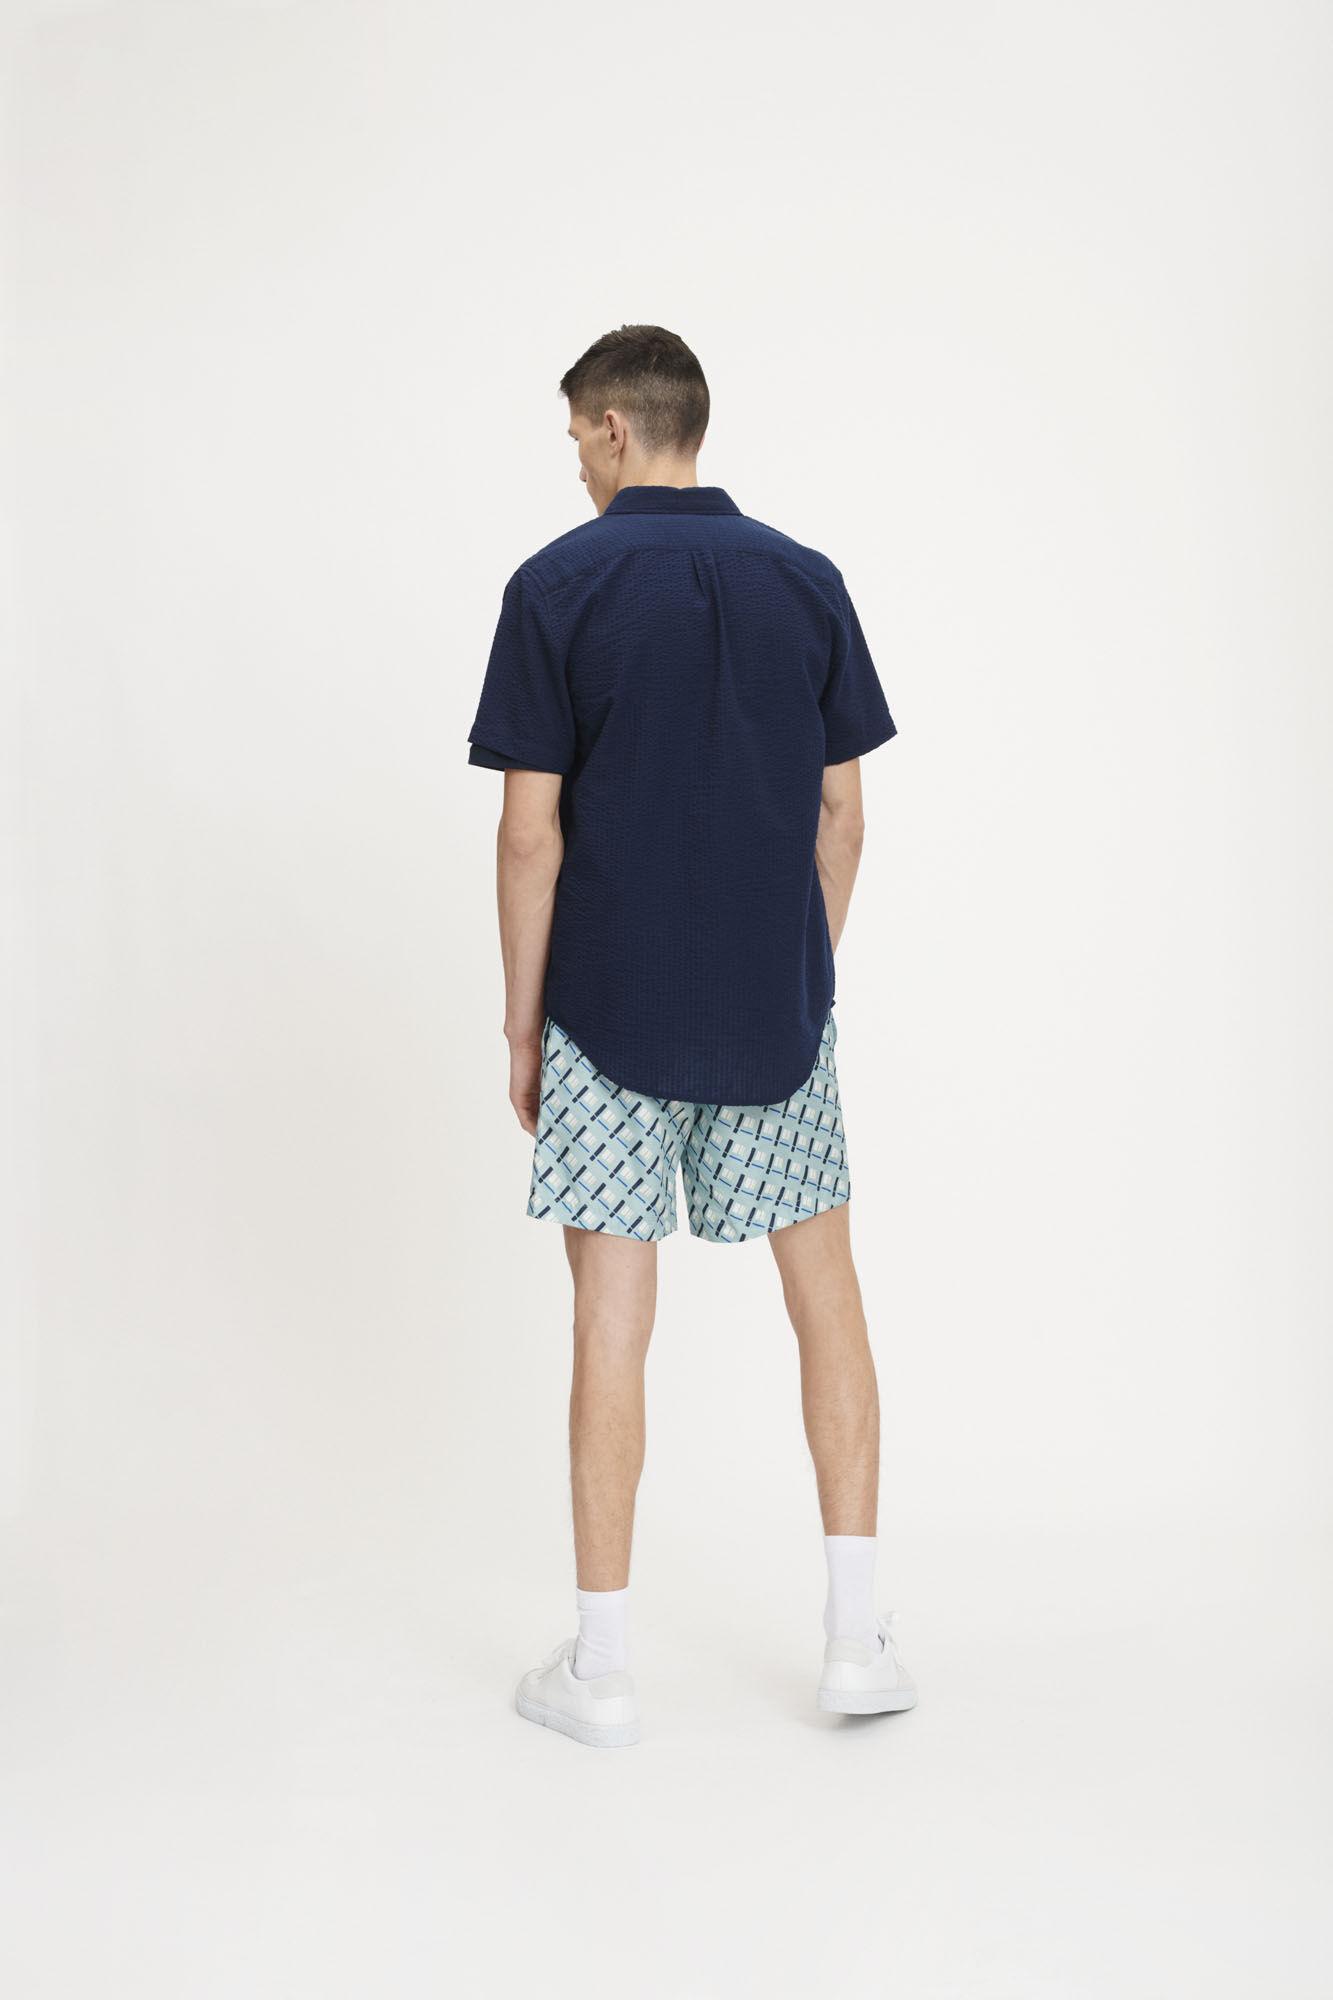 Hejls swim shorts aop 10937